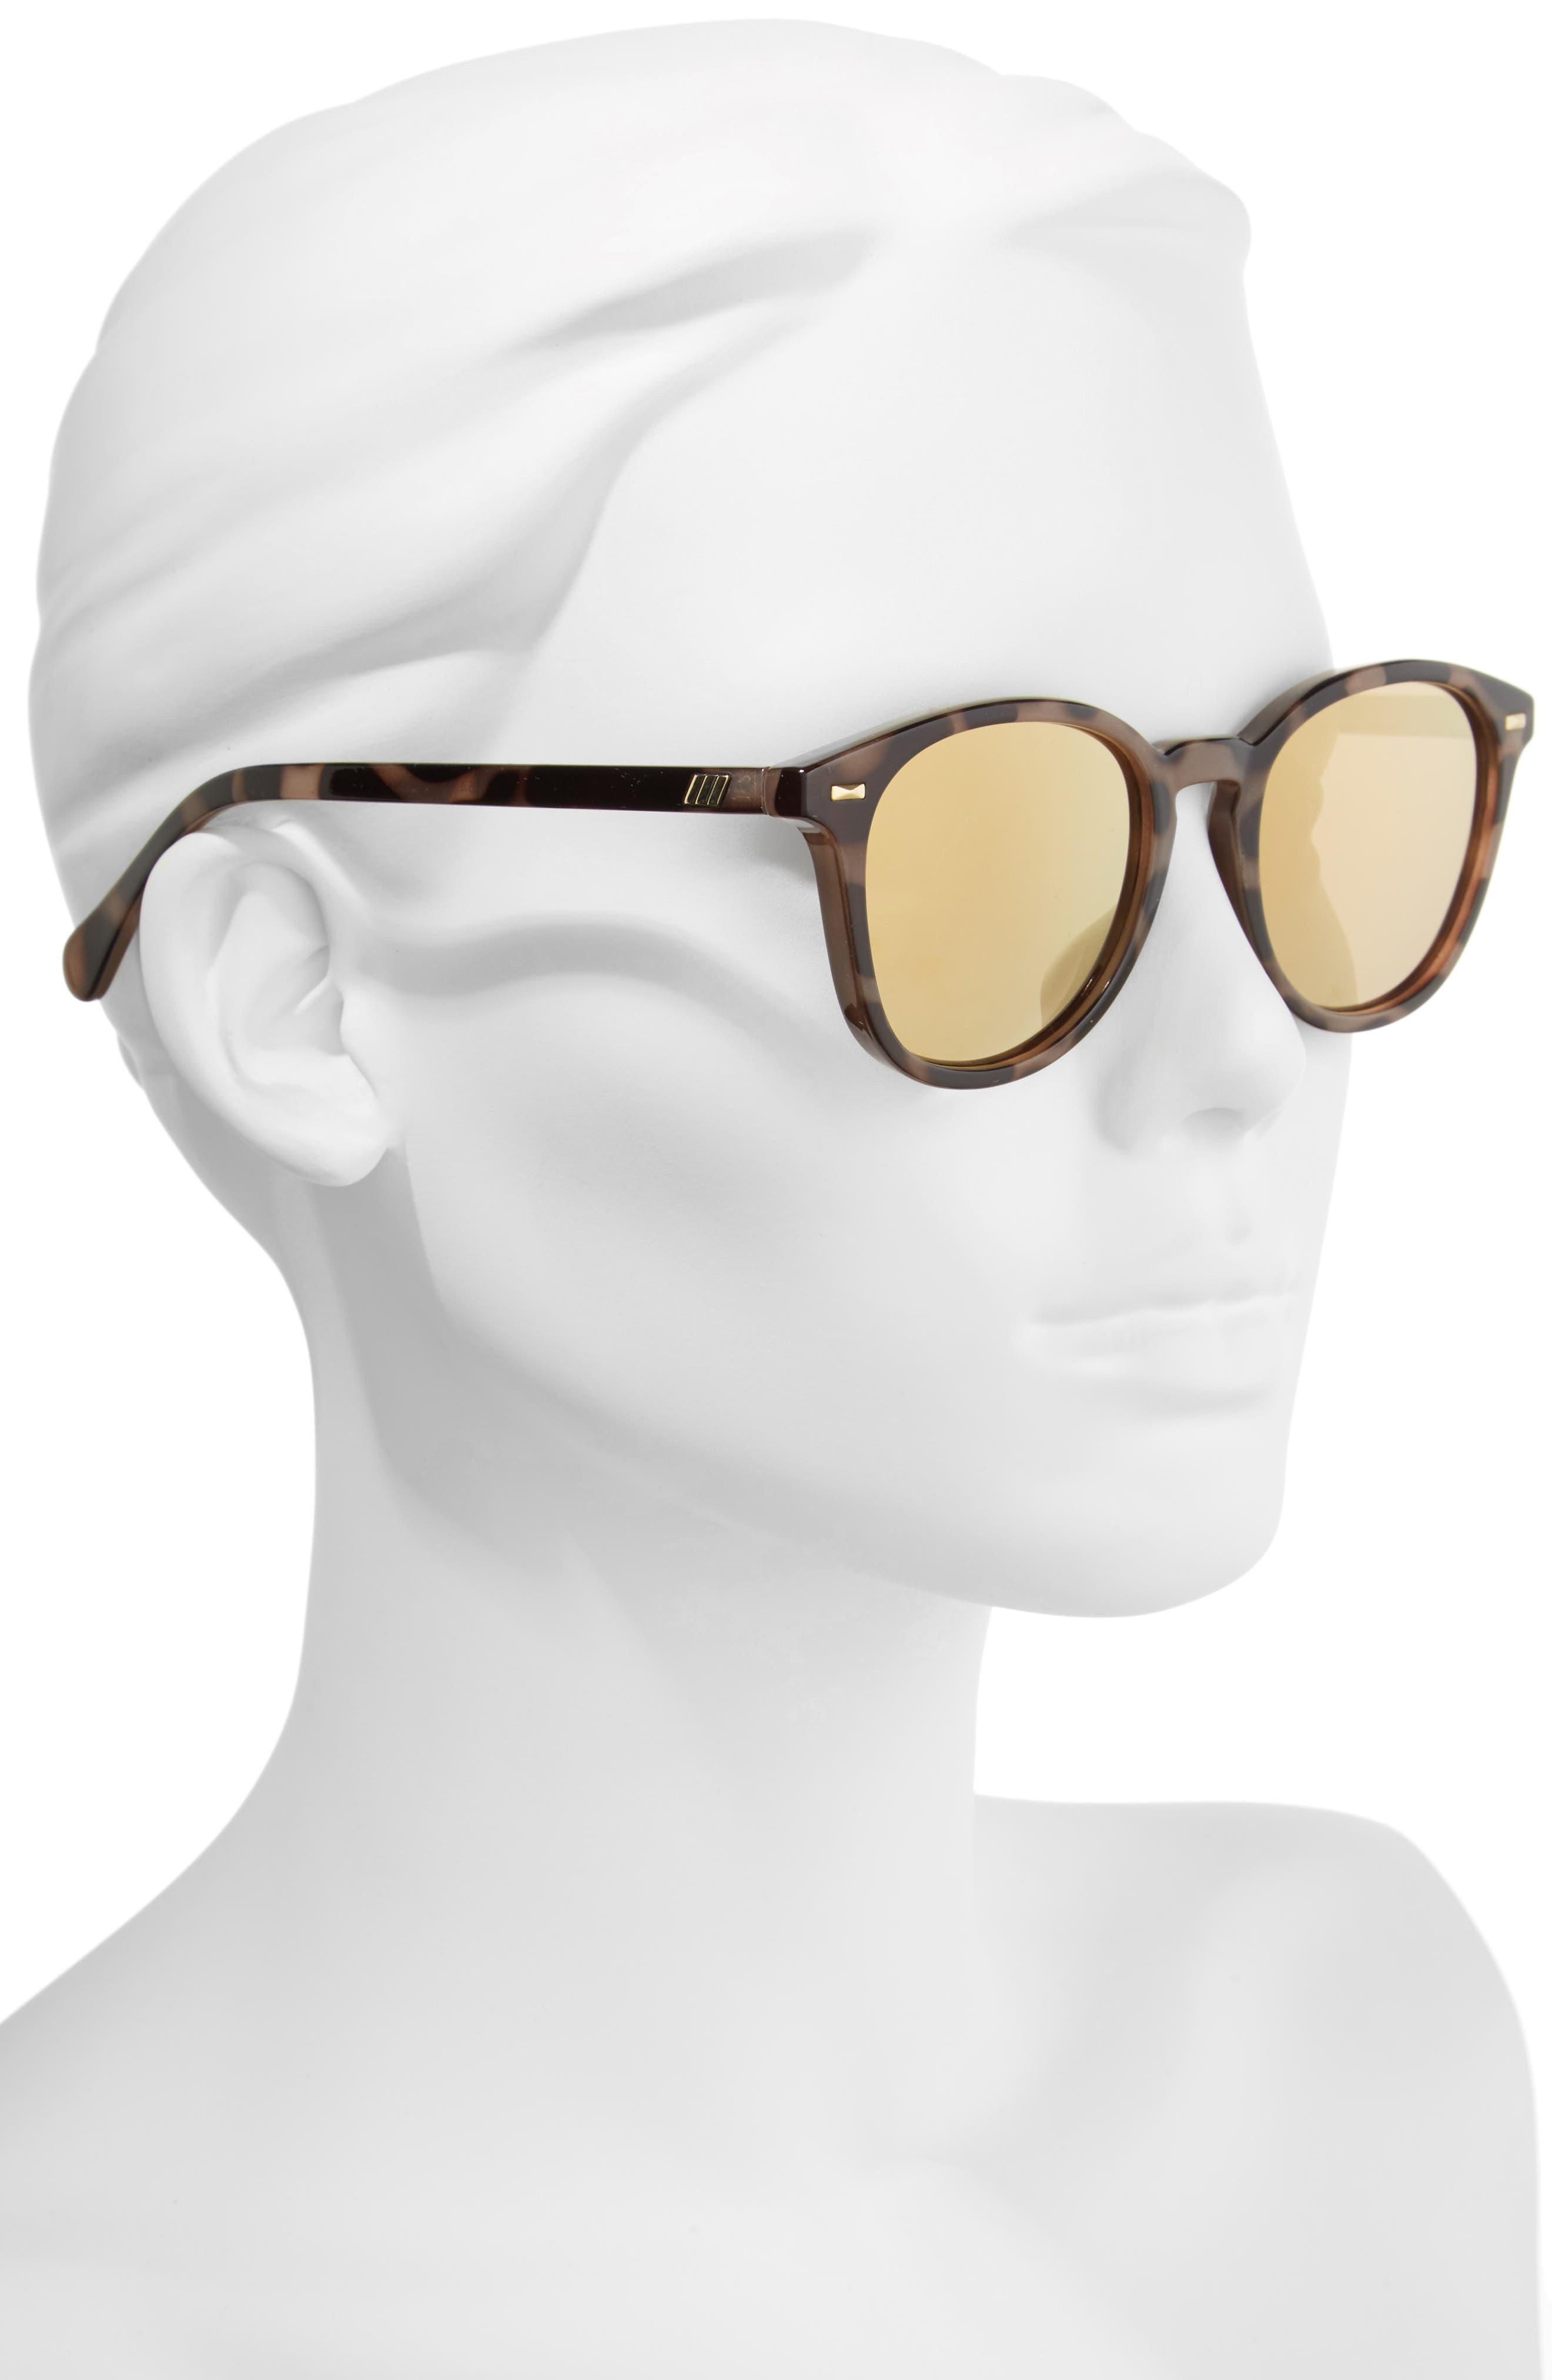 x Lumira Bandwagon 51mm Sunglasses & Candle Gift Set,                             Alternate thumbnail 3, color,                             Volcanic Tort